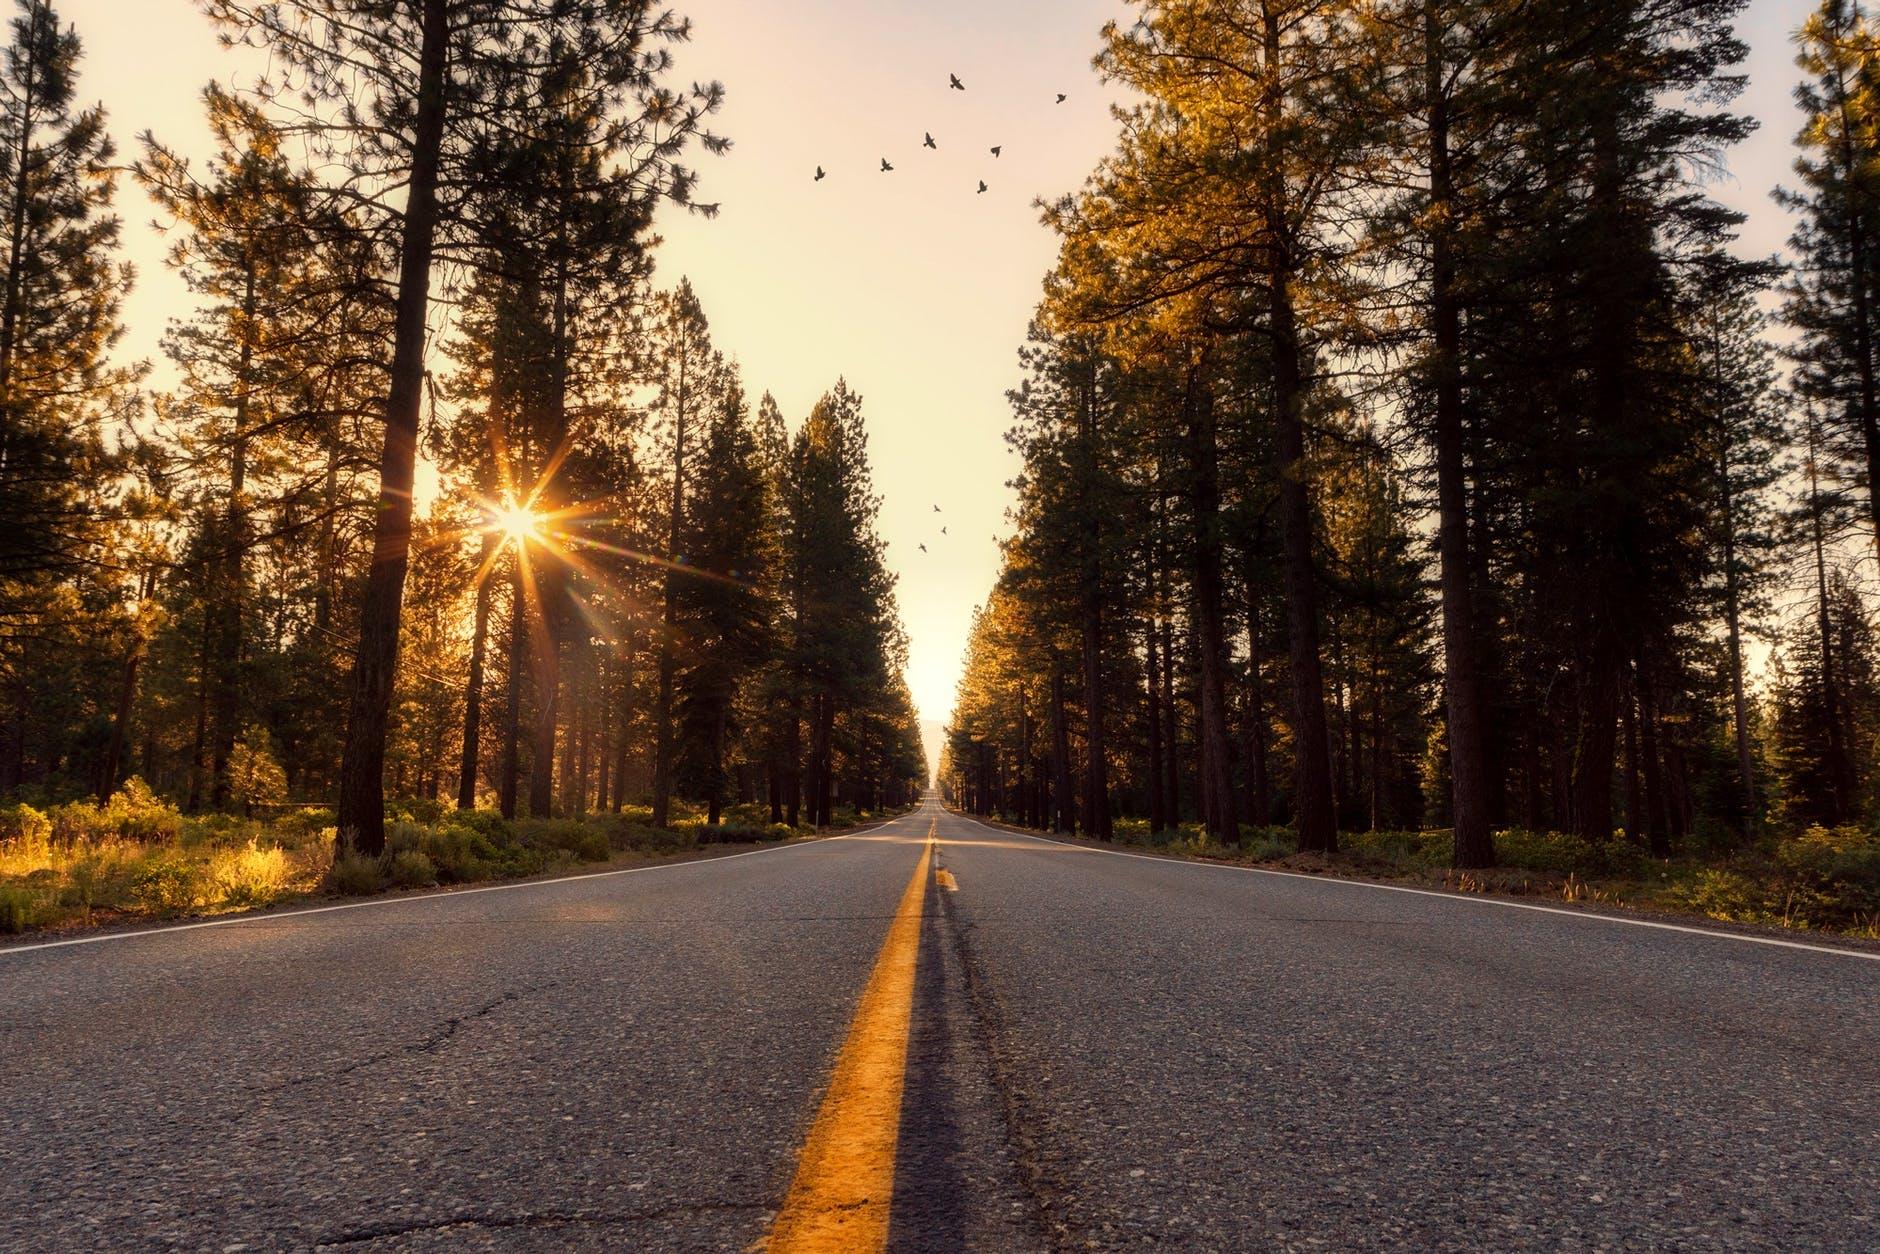 adventure asphalt california country